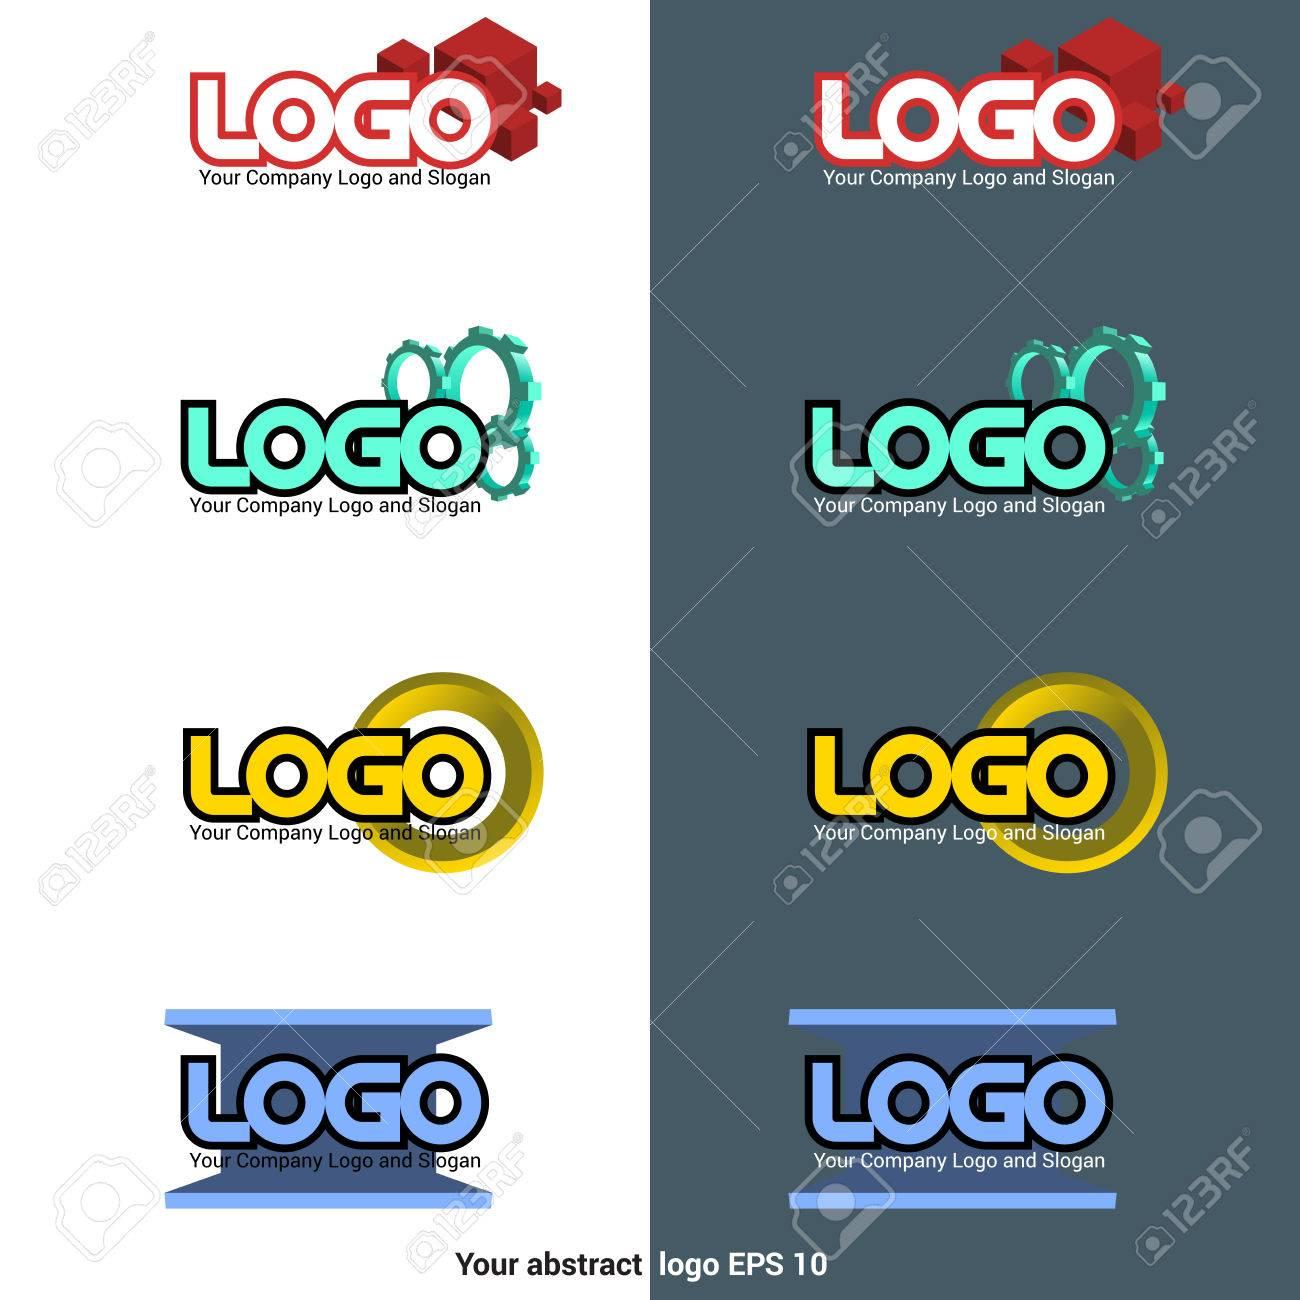 Construction company logotype sign templates logo with bricks construction company logotype sign templates logo with bricks logo with cogwheels logo with colourmoves Images